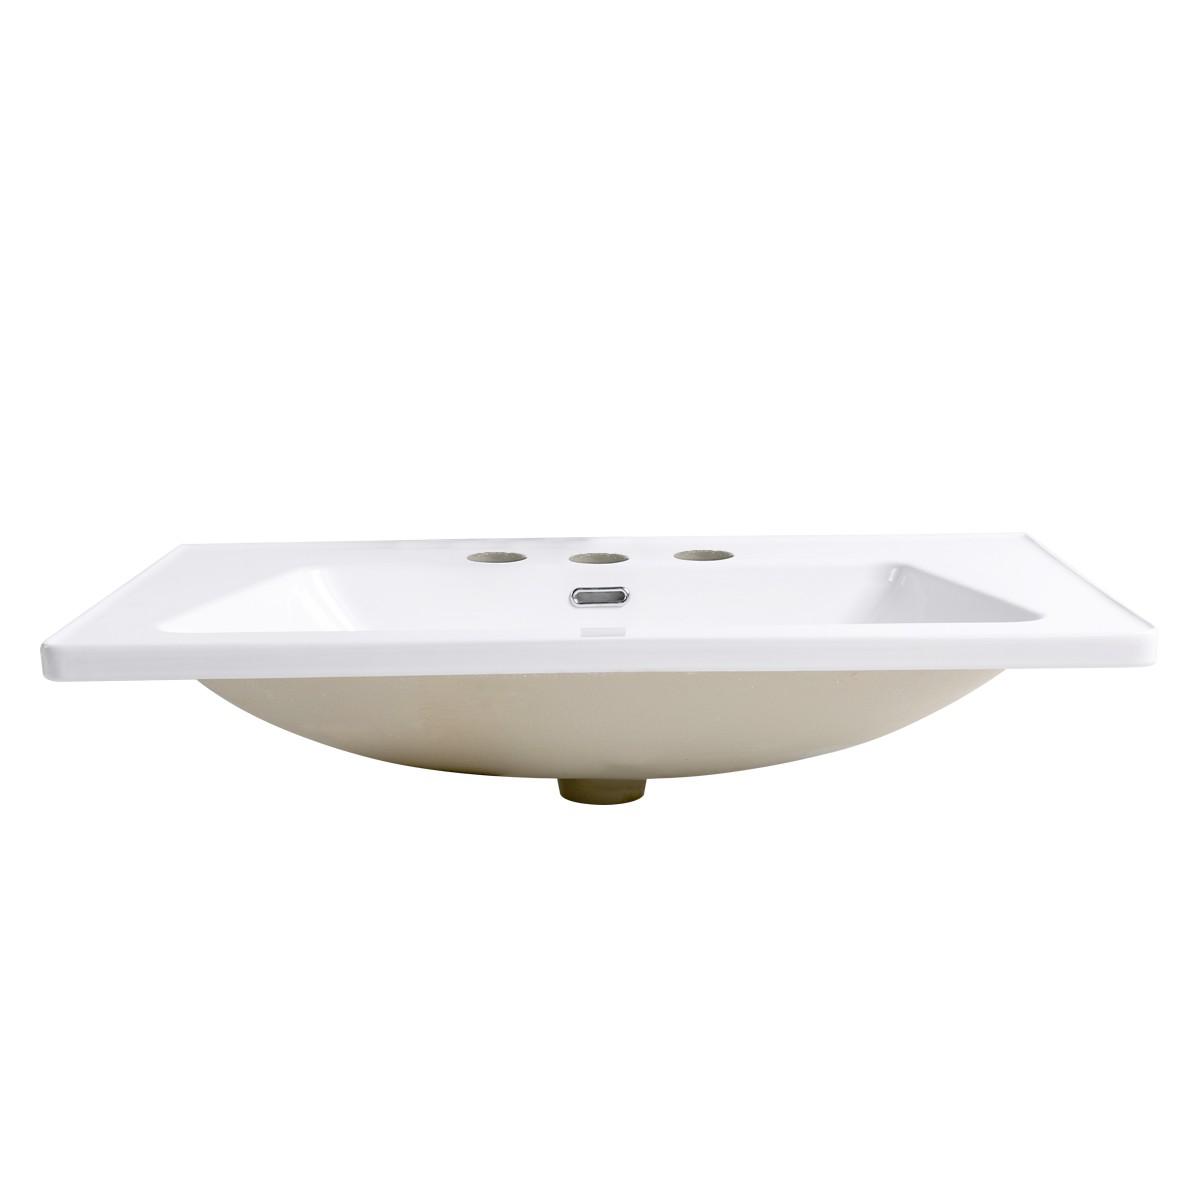 Self Rimming for Bathroom White Grade A Porcelain Centerset White Drop In Sink Dropin Bathroom Sink Drop In Rectangular Bathroom Sink